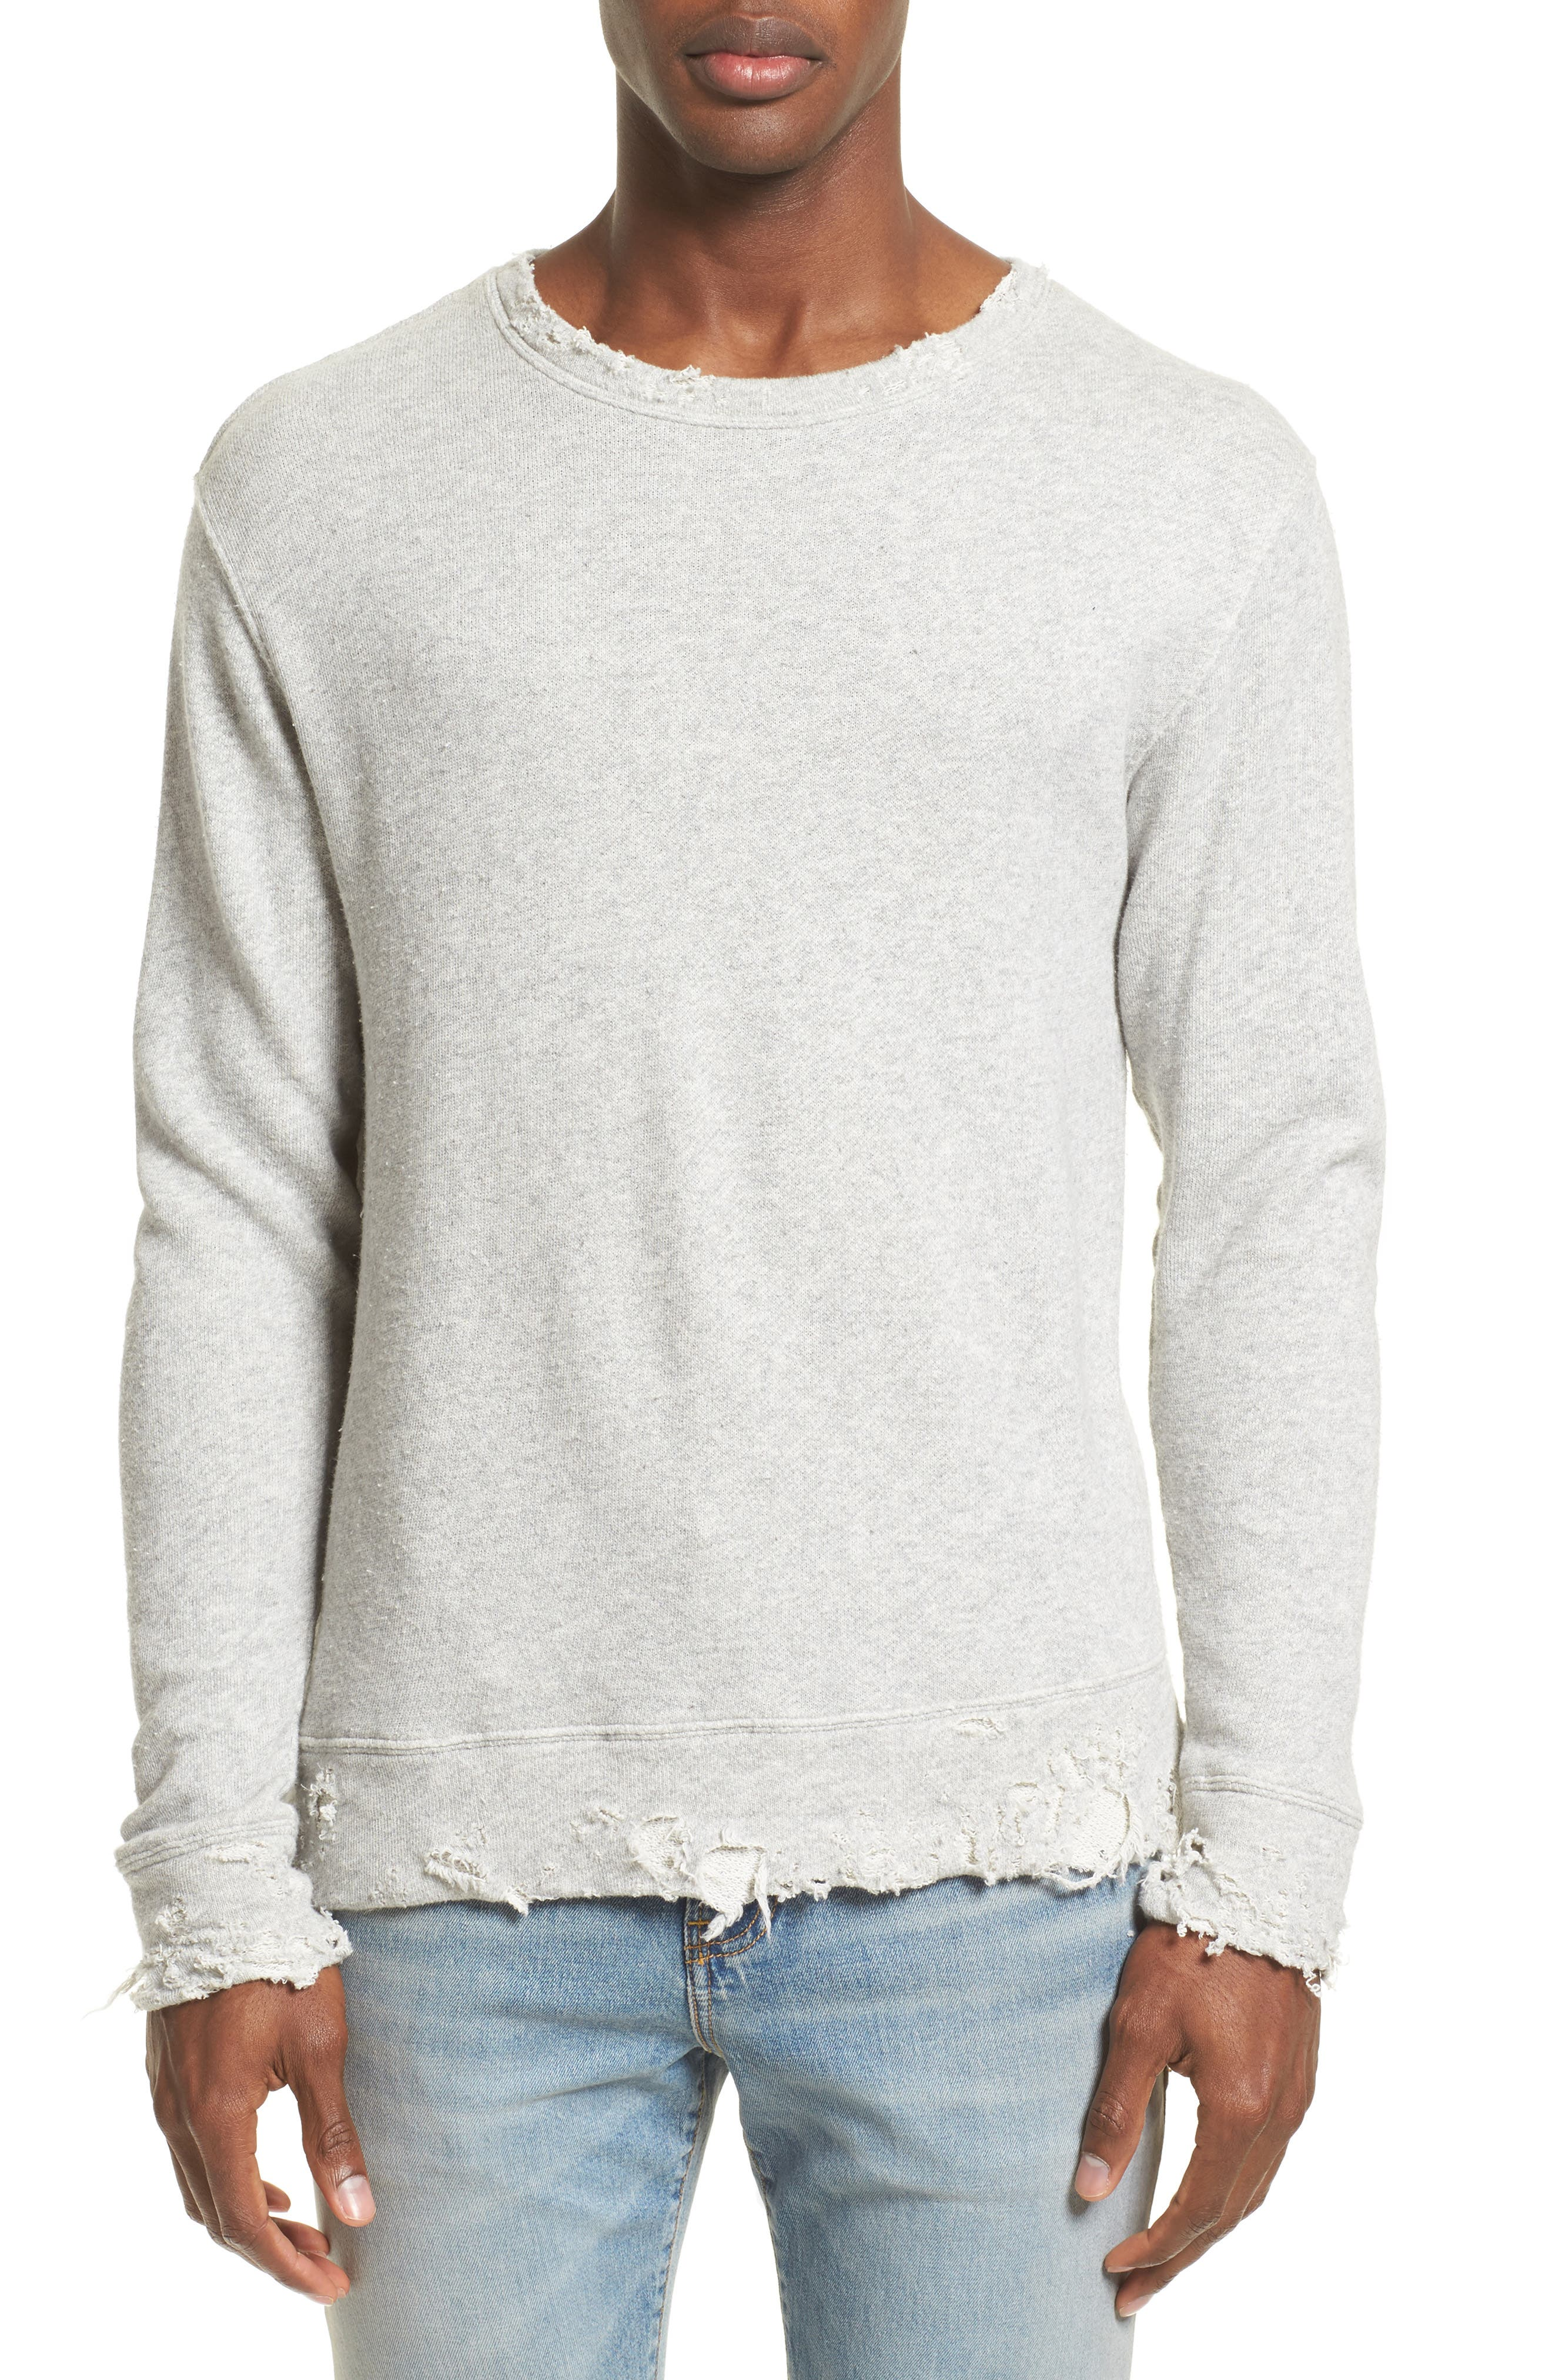 R13 Vintage Distressed Sweatshirt